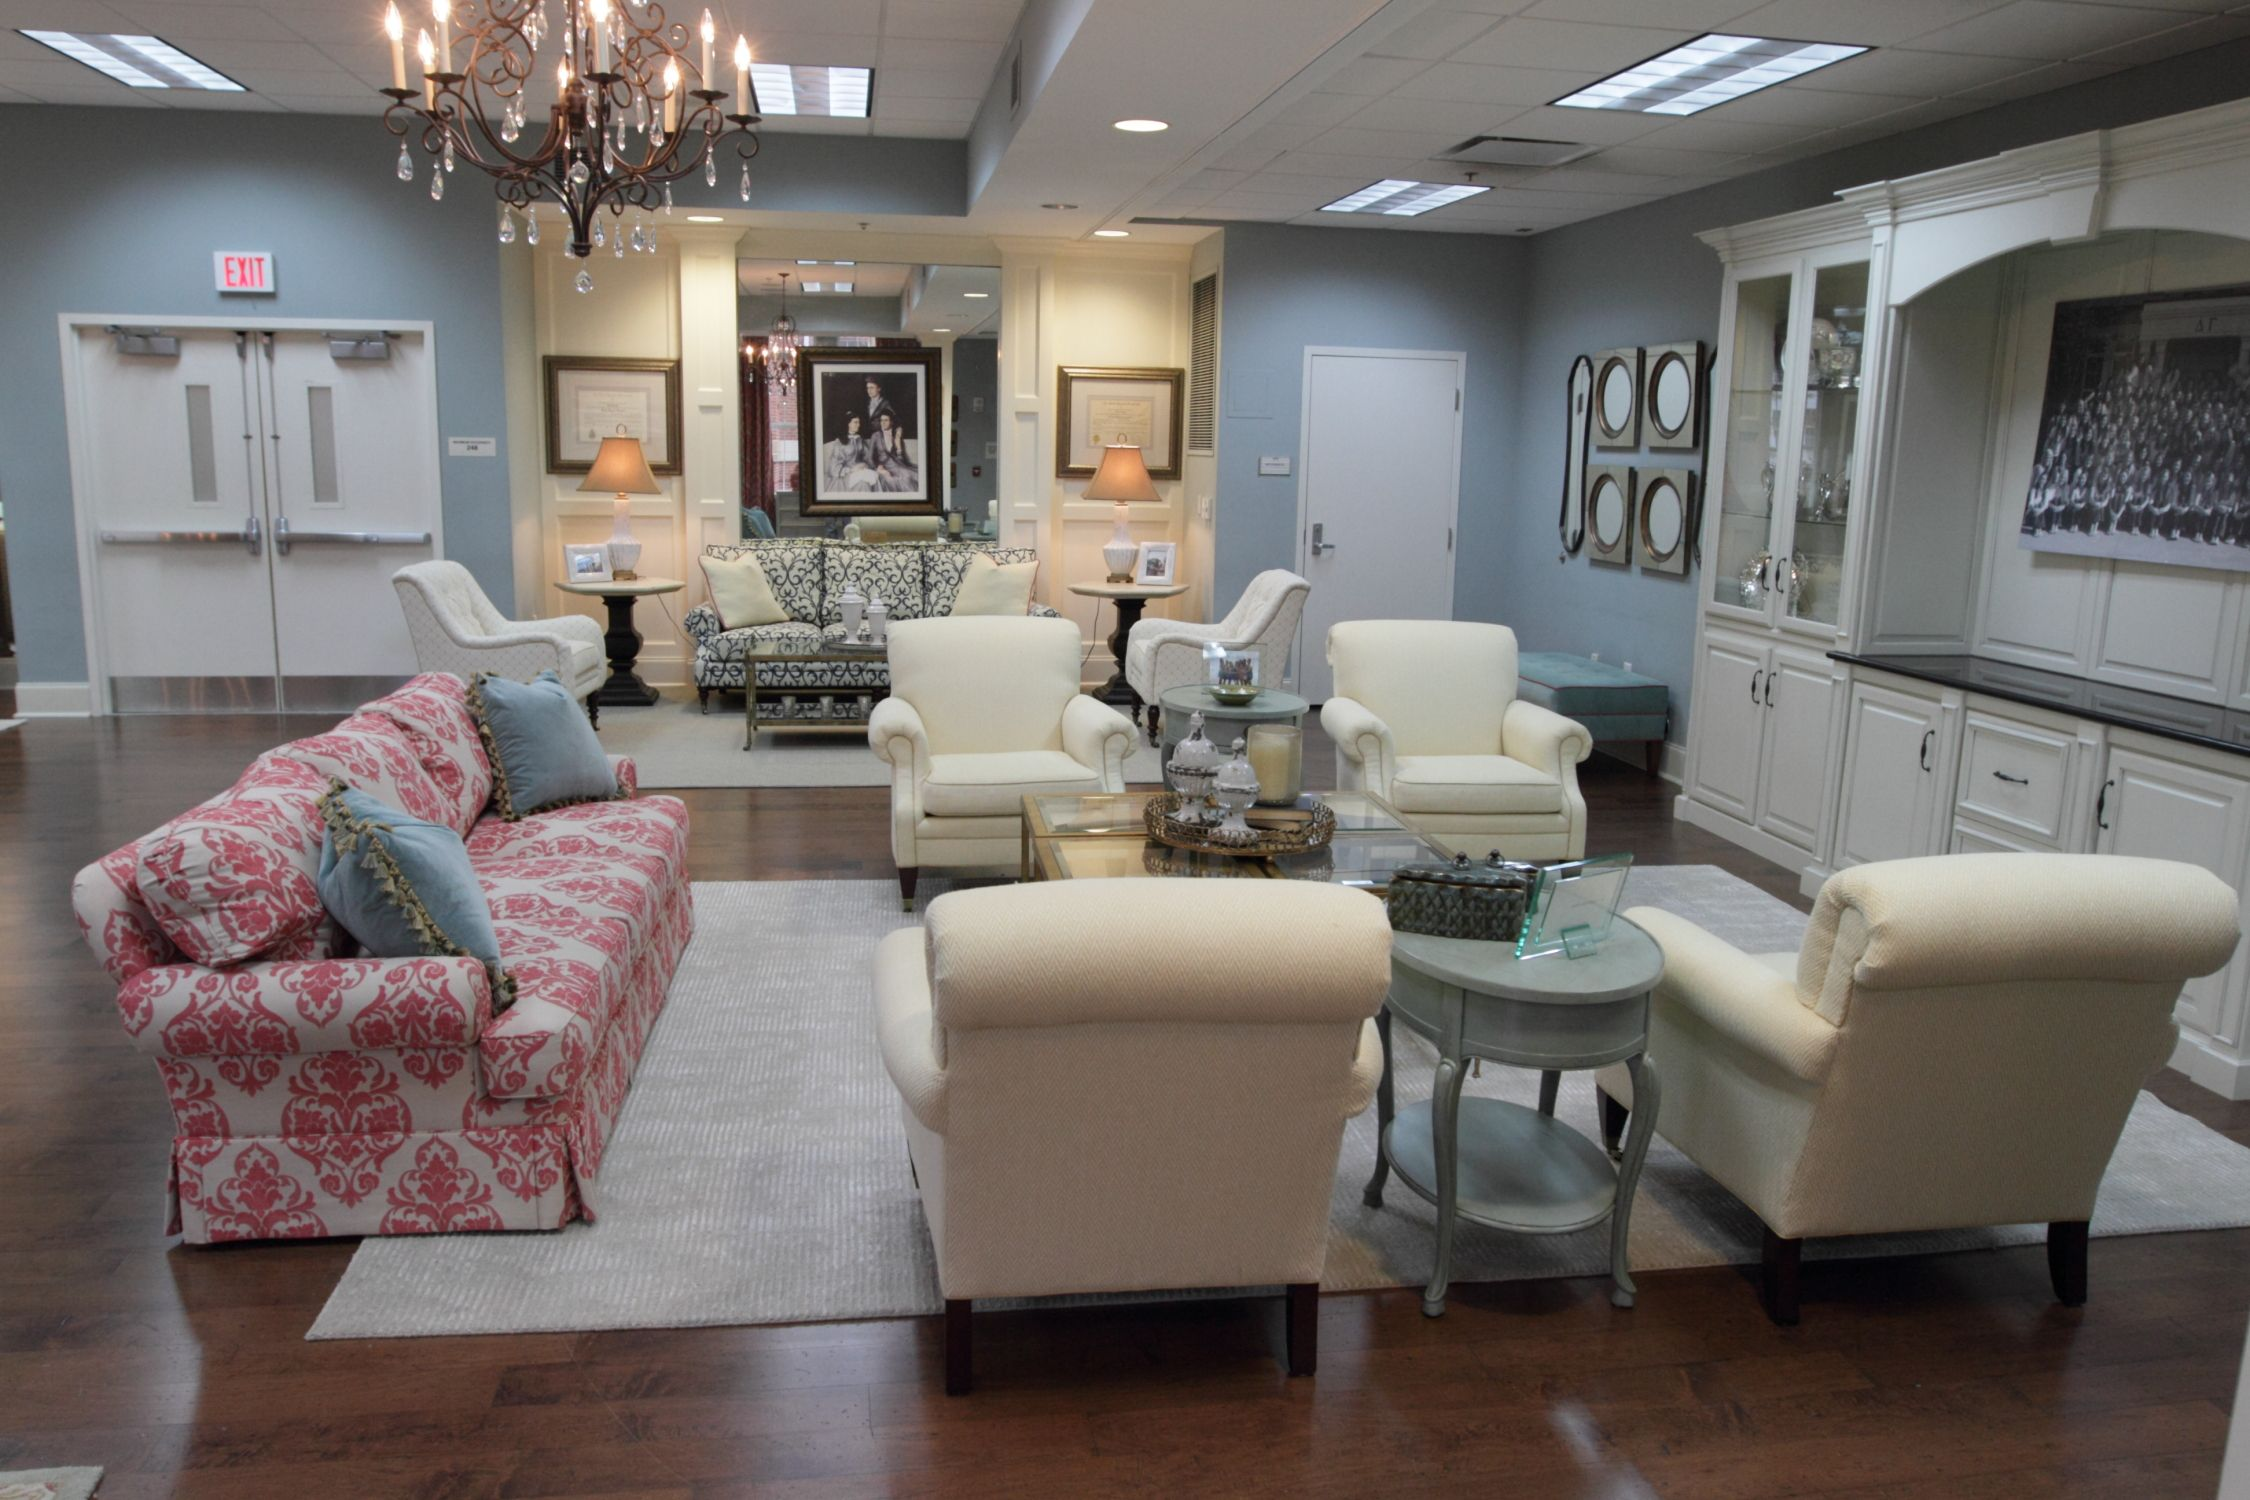 Seating arrangements damask fabric compilation of - Auburn university interior design program ...